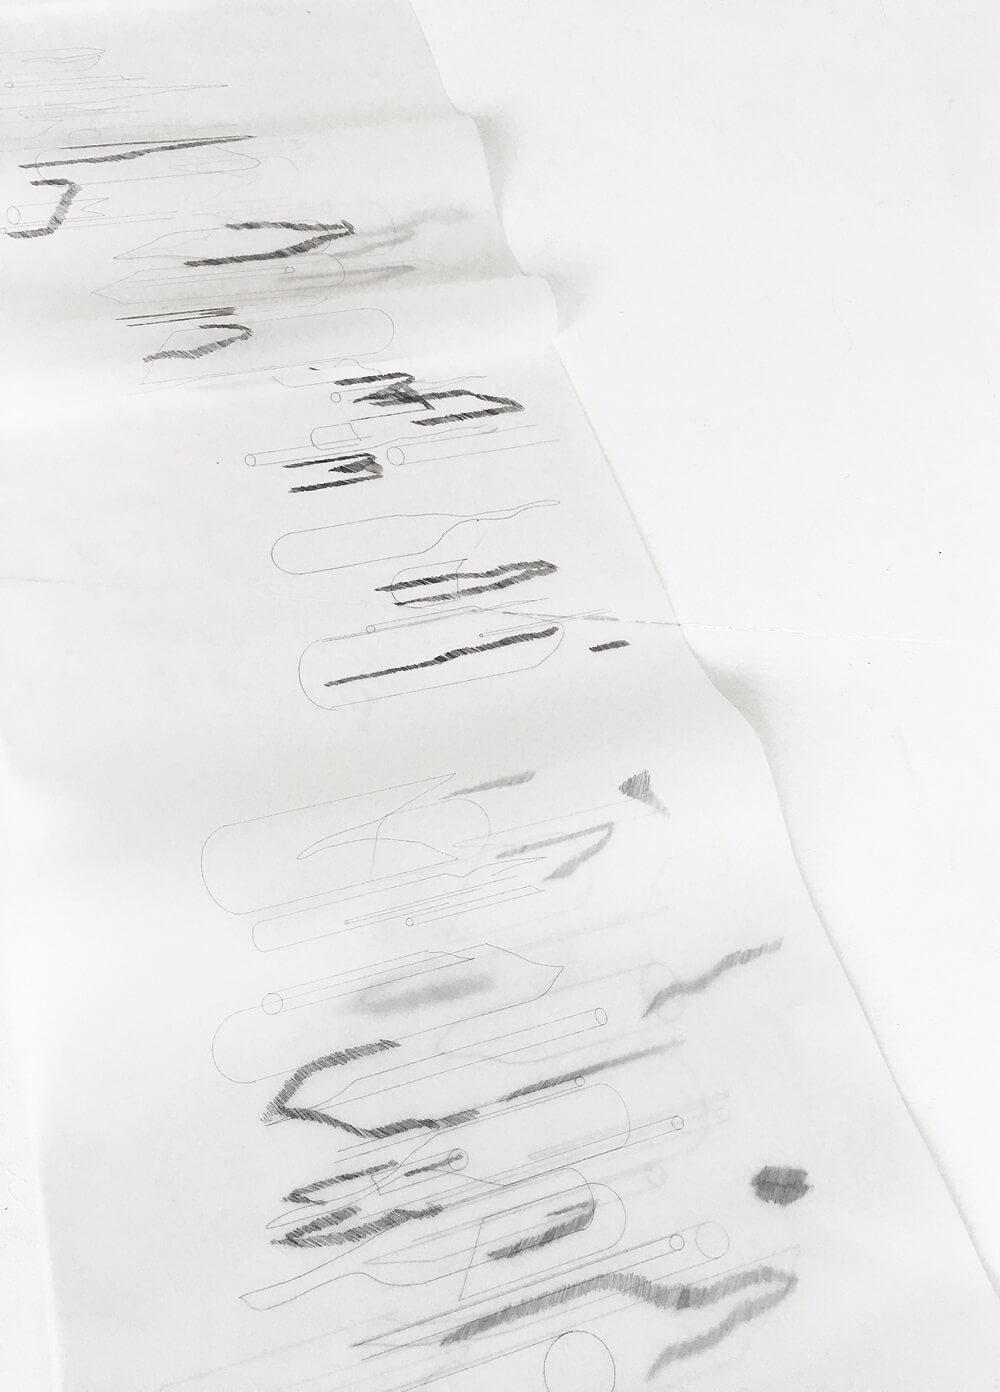 Stella Rahola Matutes, Axonometrics, 2019